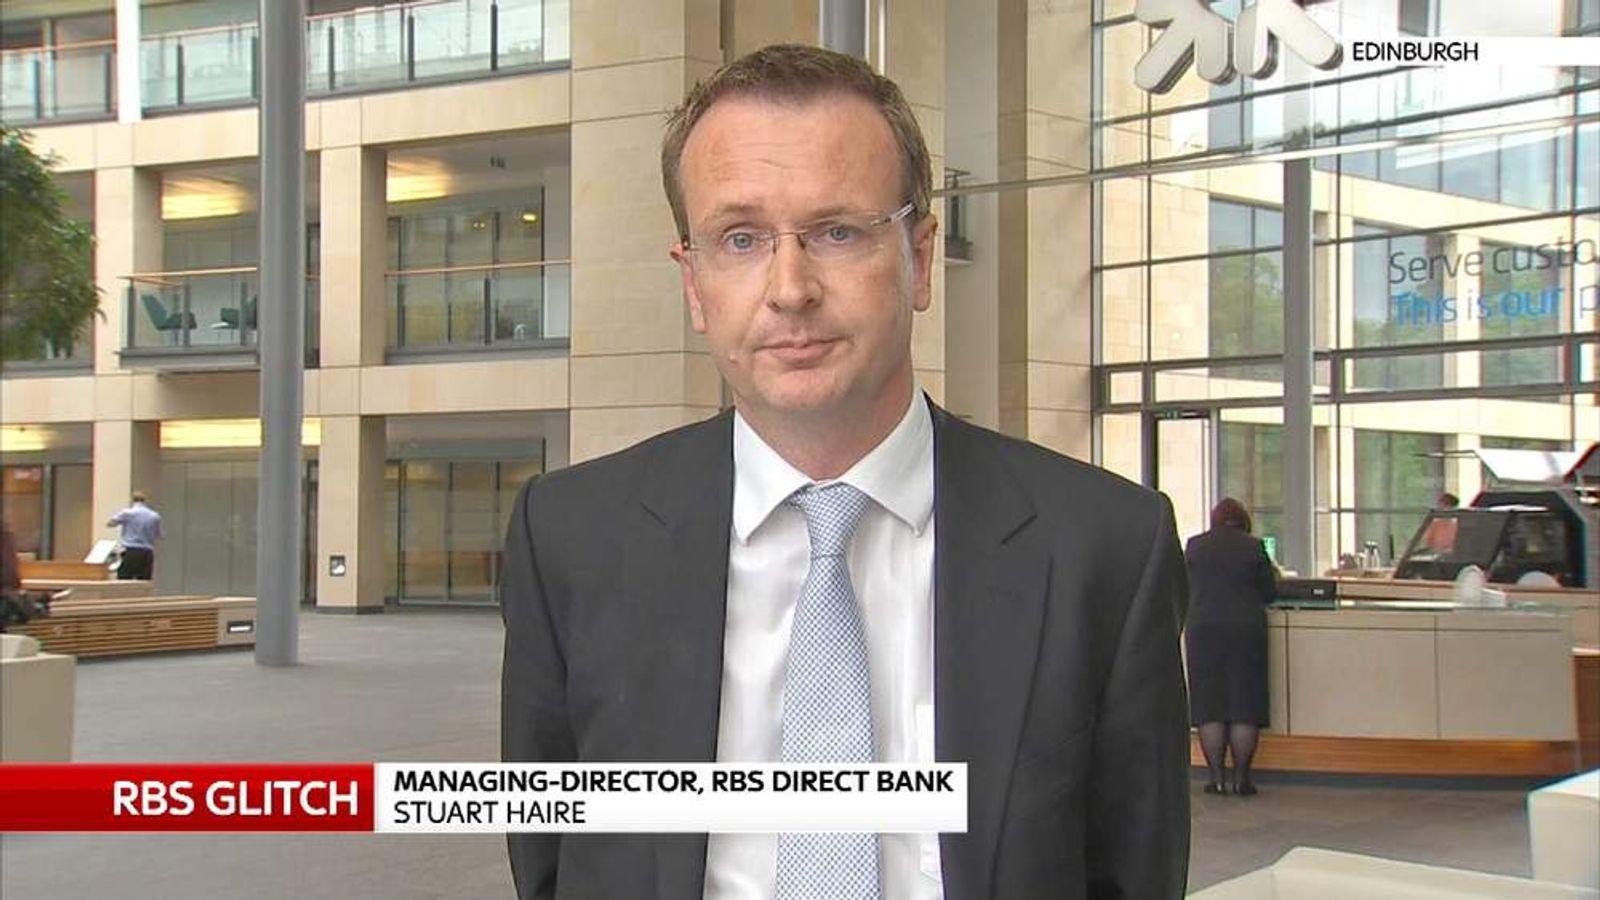 Stuart Hare, Managing director RBS Direct Bank